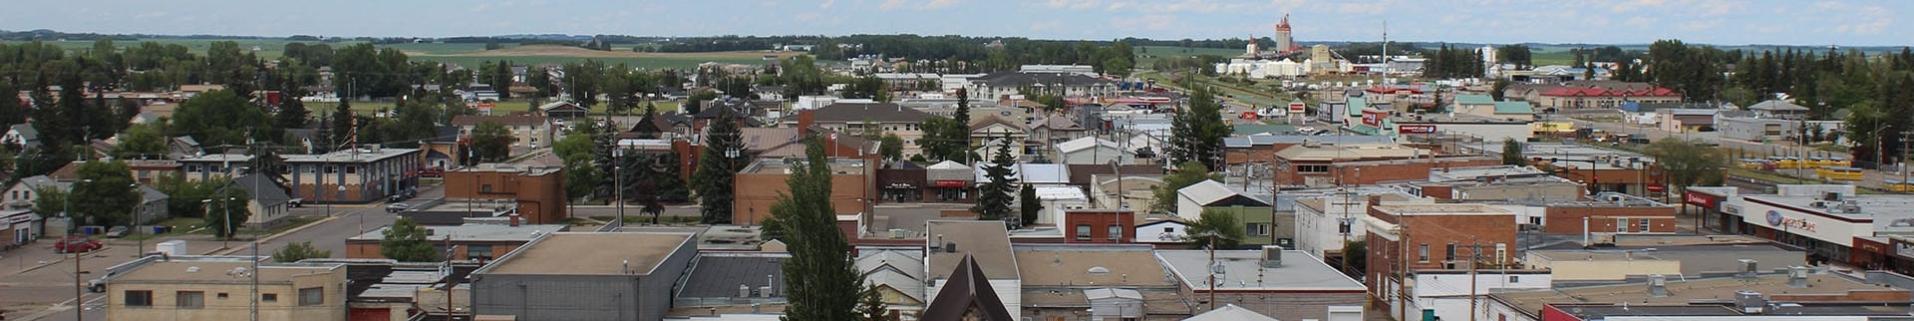 Town of Olds Neighbourhood